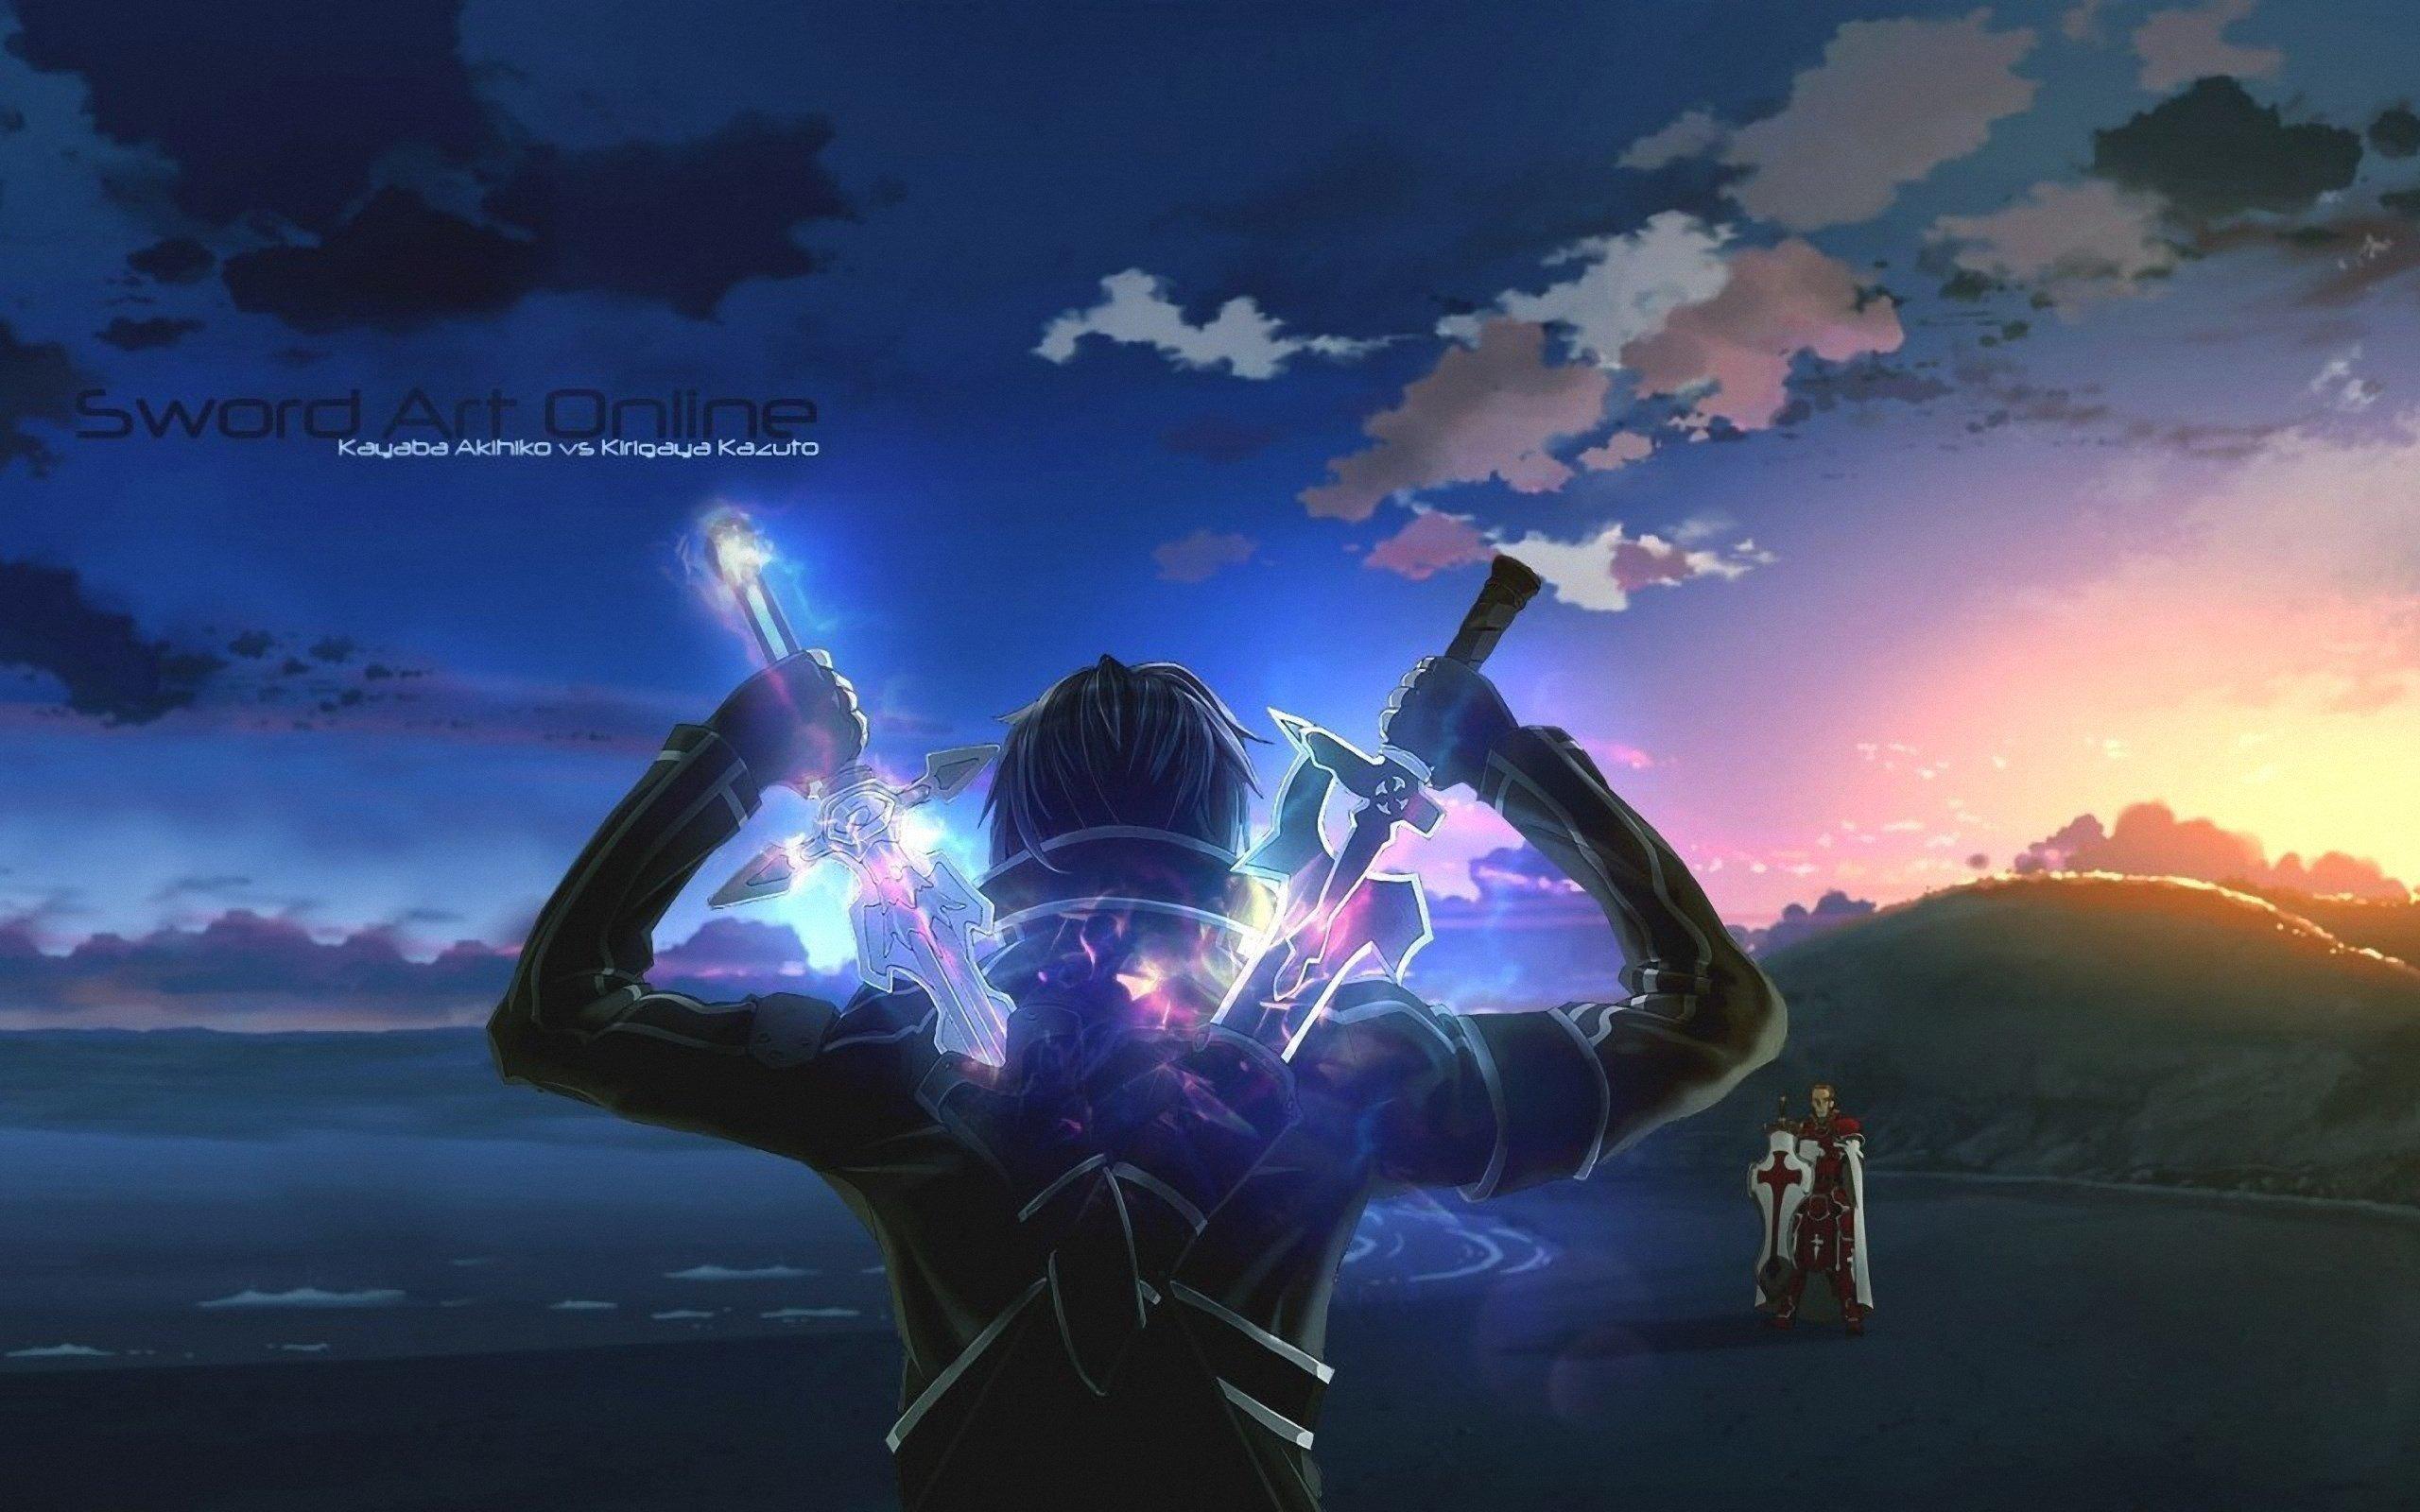 42 Sword Art Online Wallpaper Hd On Wallpapersafari